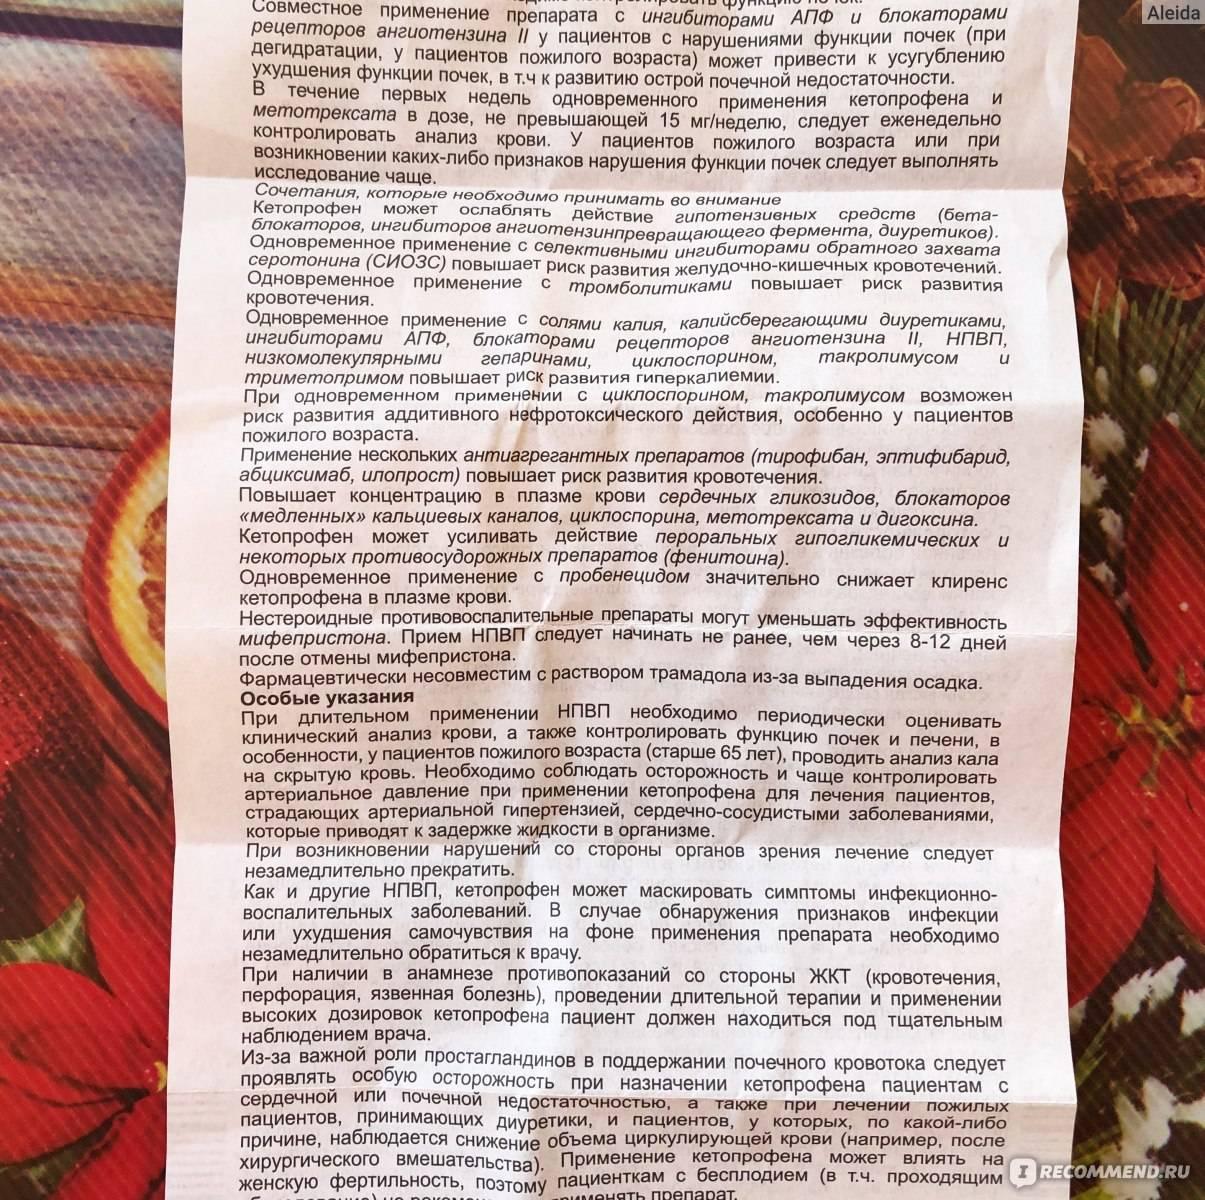 ᐉ обезболивающее для кошек в домашних условиях, кетанов кошке дозировка - zoomanji.ru